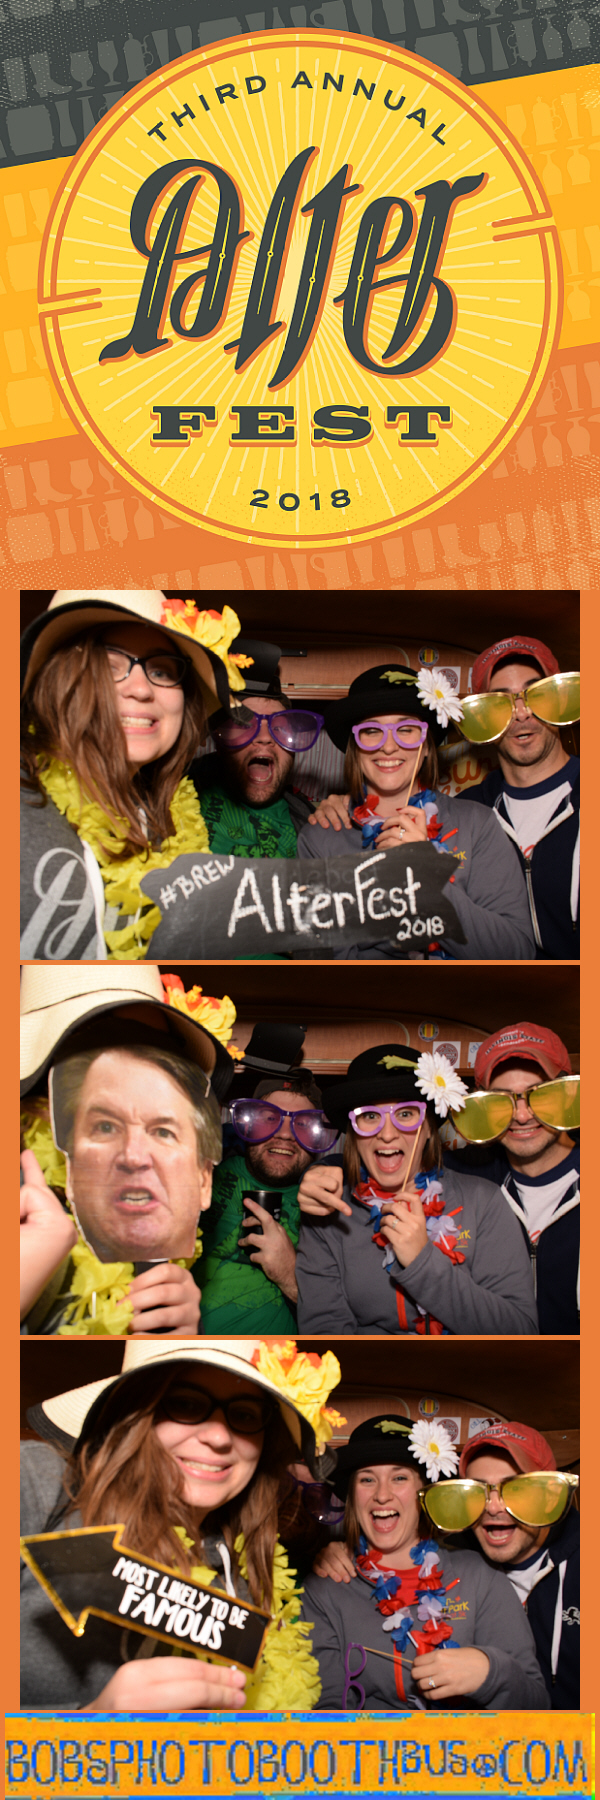 AlterFest2018bobsphotoboothbusrobertkinsloe_92.jpg